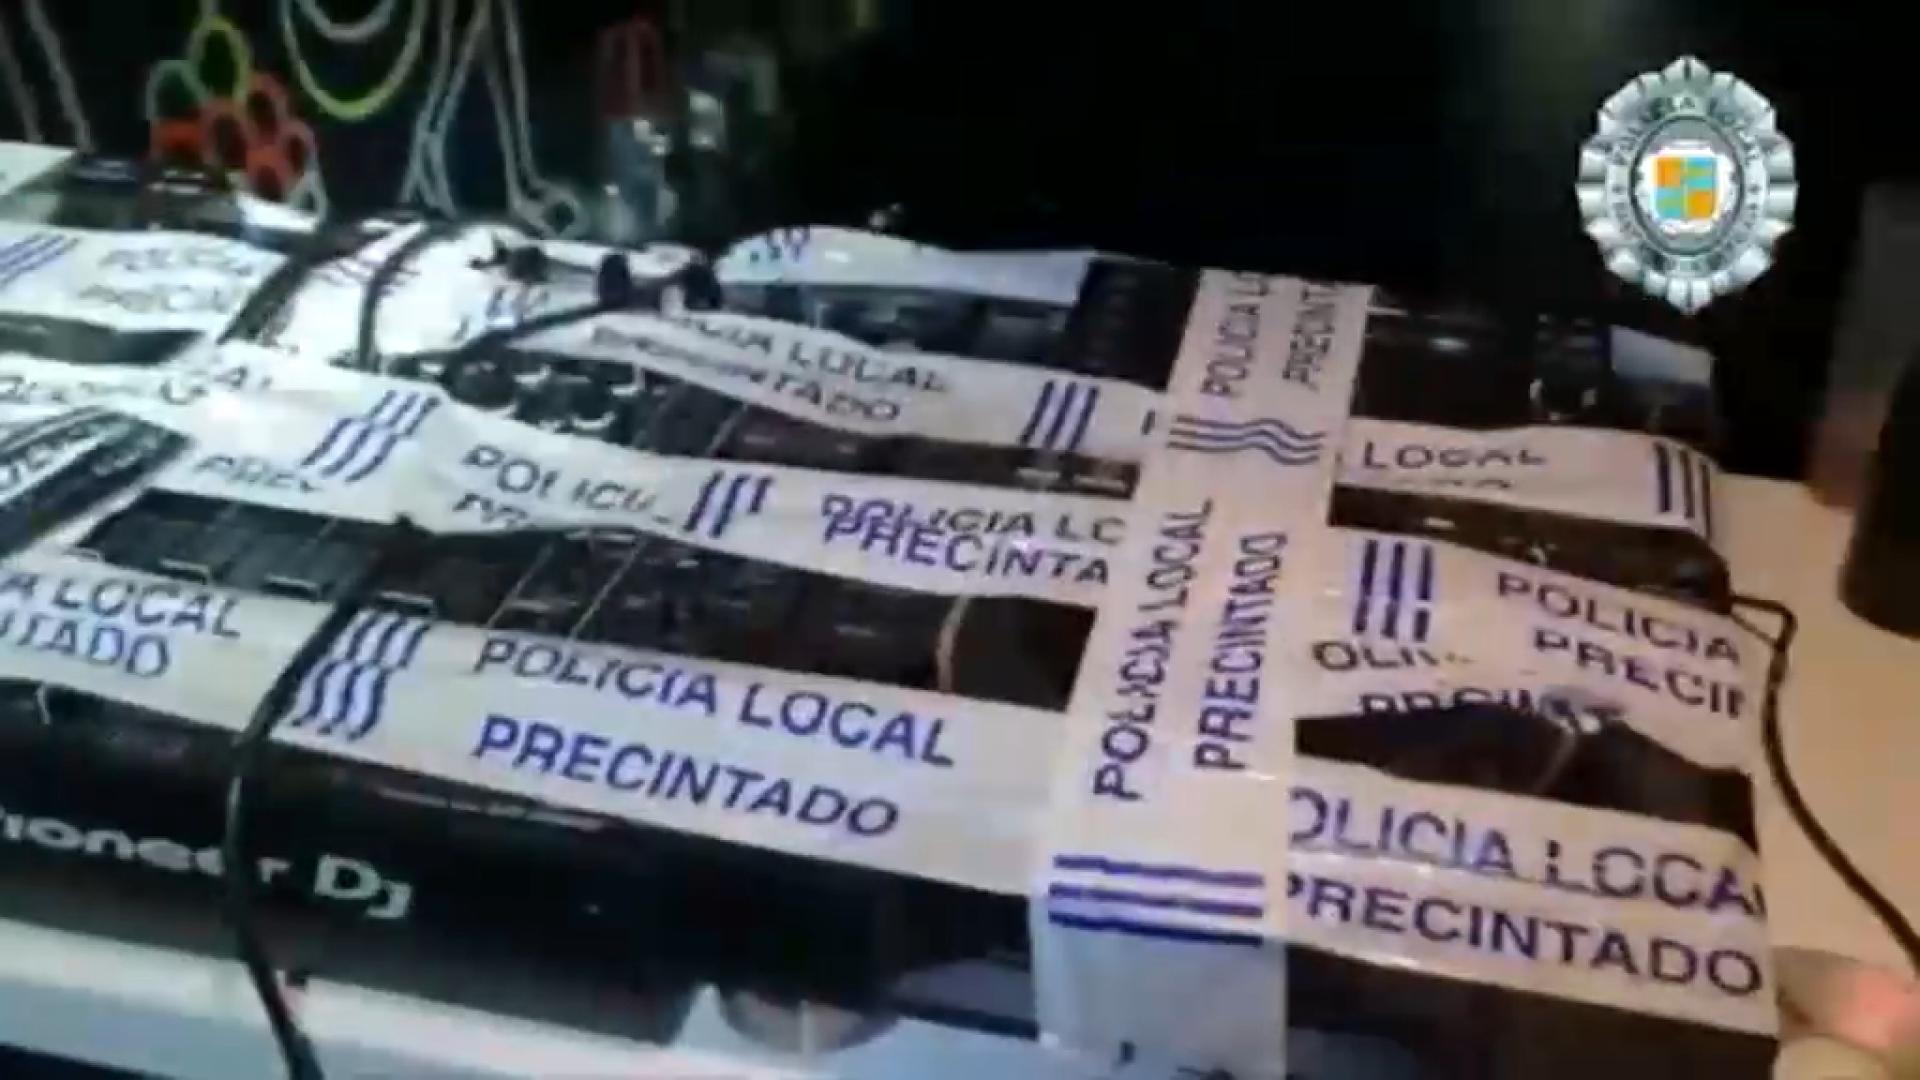 L%26apos%3Boci+nocturn+xapat+i+m%C3%A9s+festes+il%C2%B7legals+que+mai+a+Eivissa+i+Formentera